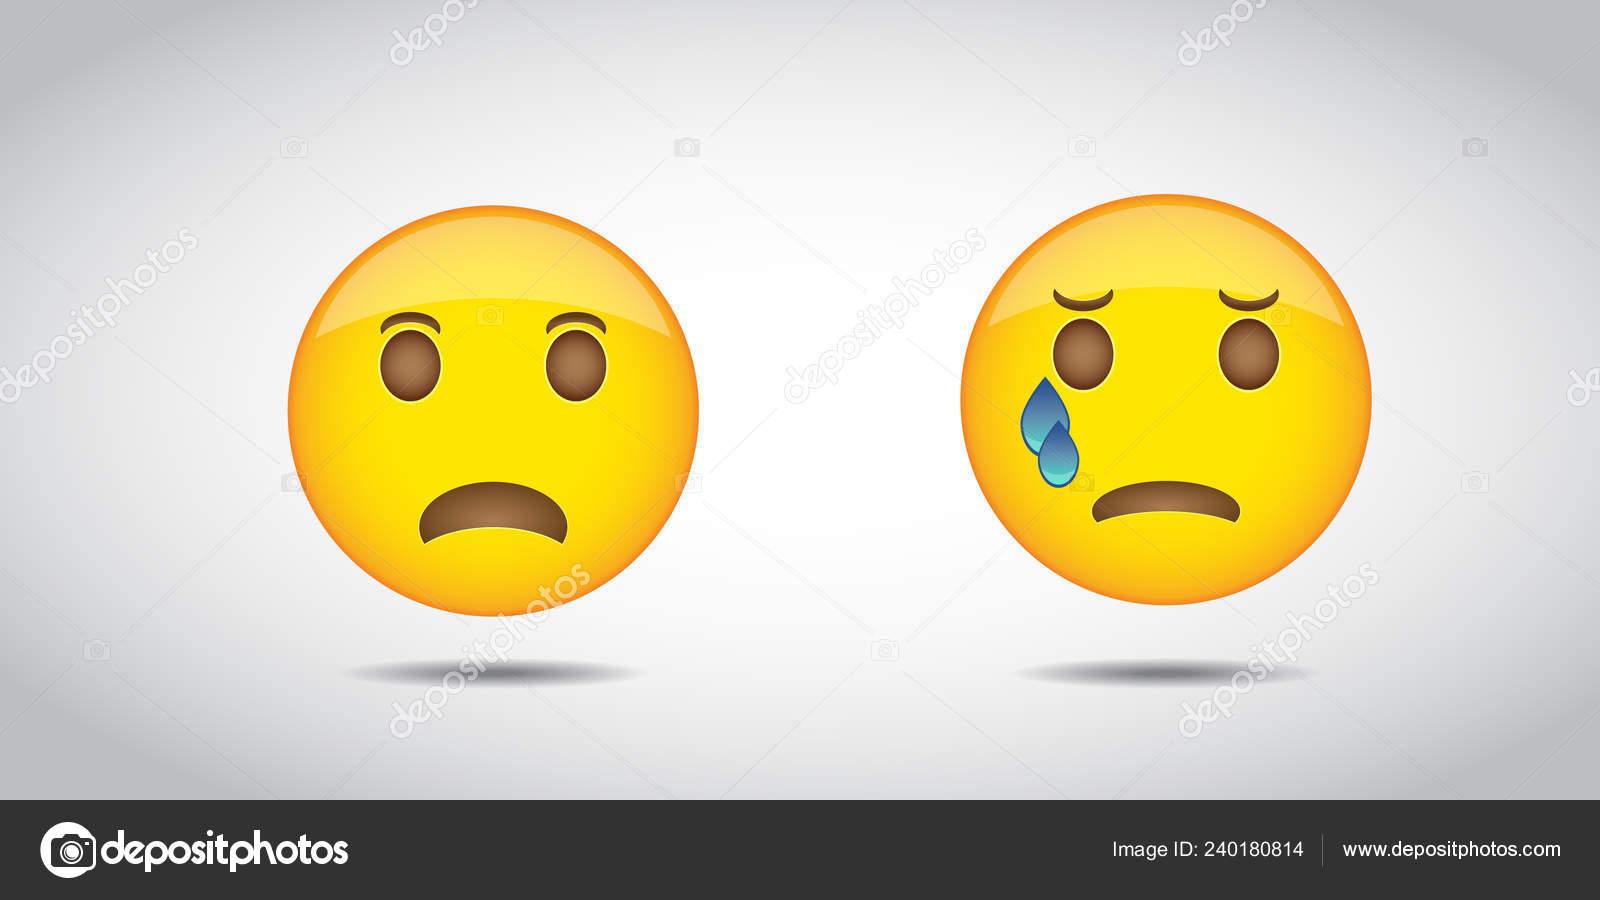 Sad Emoji - 1600x900 Wallpaper - teahub.io